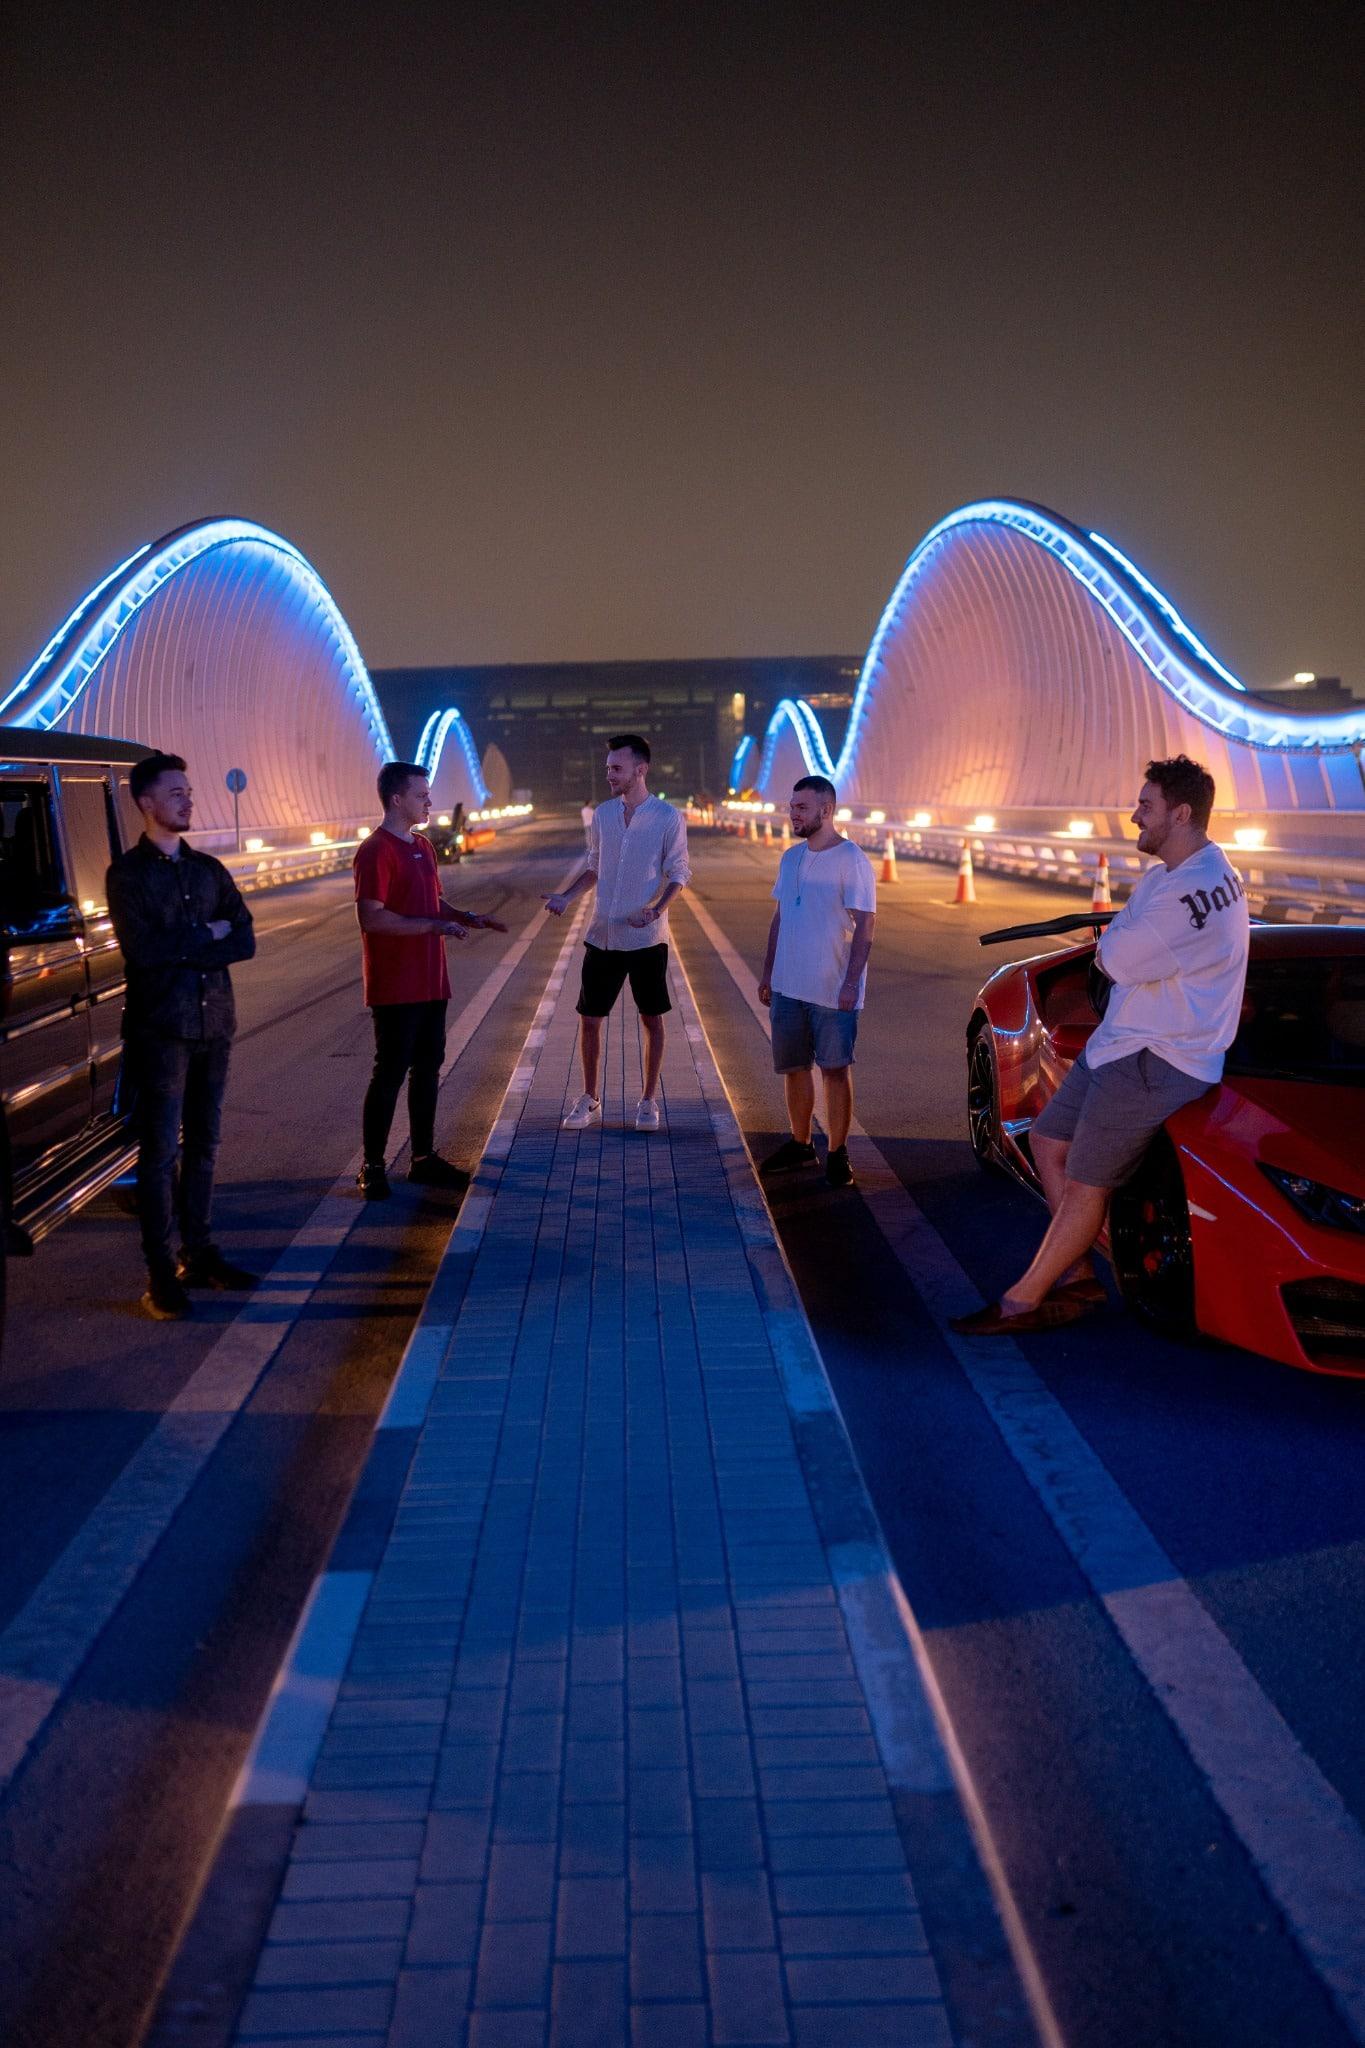 Niklas Pedde Instagram University Dubai Meydan Bridge Group Networking